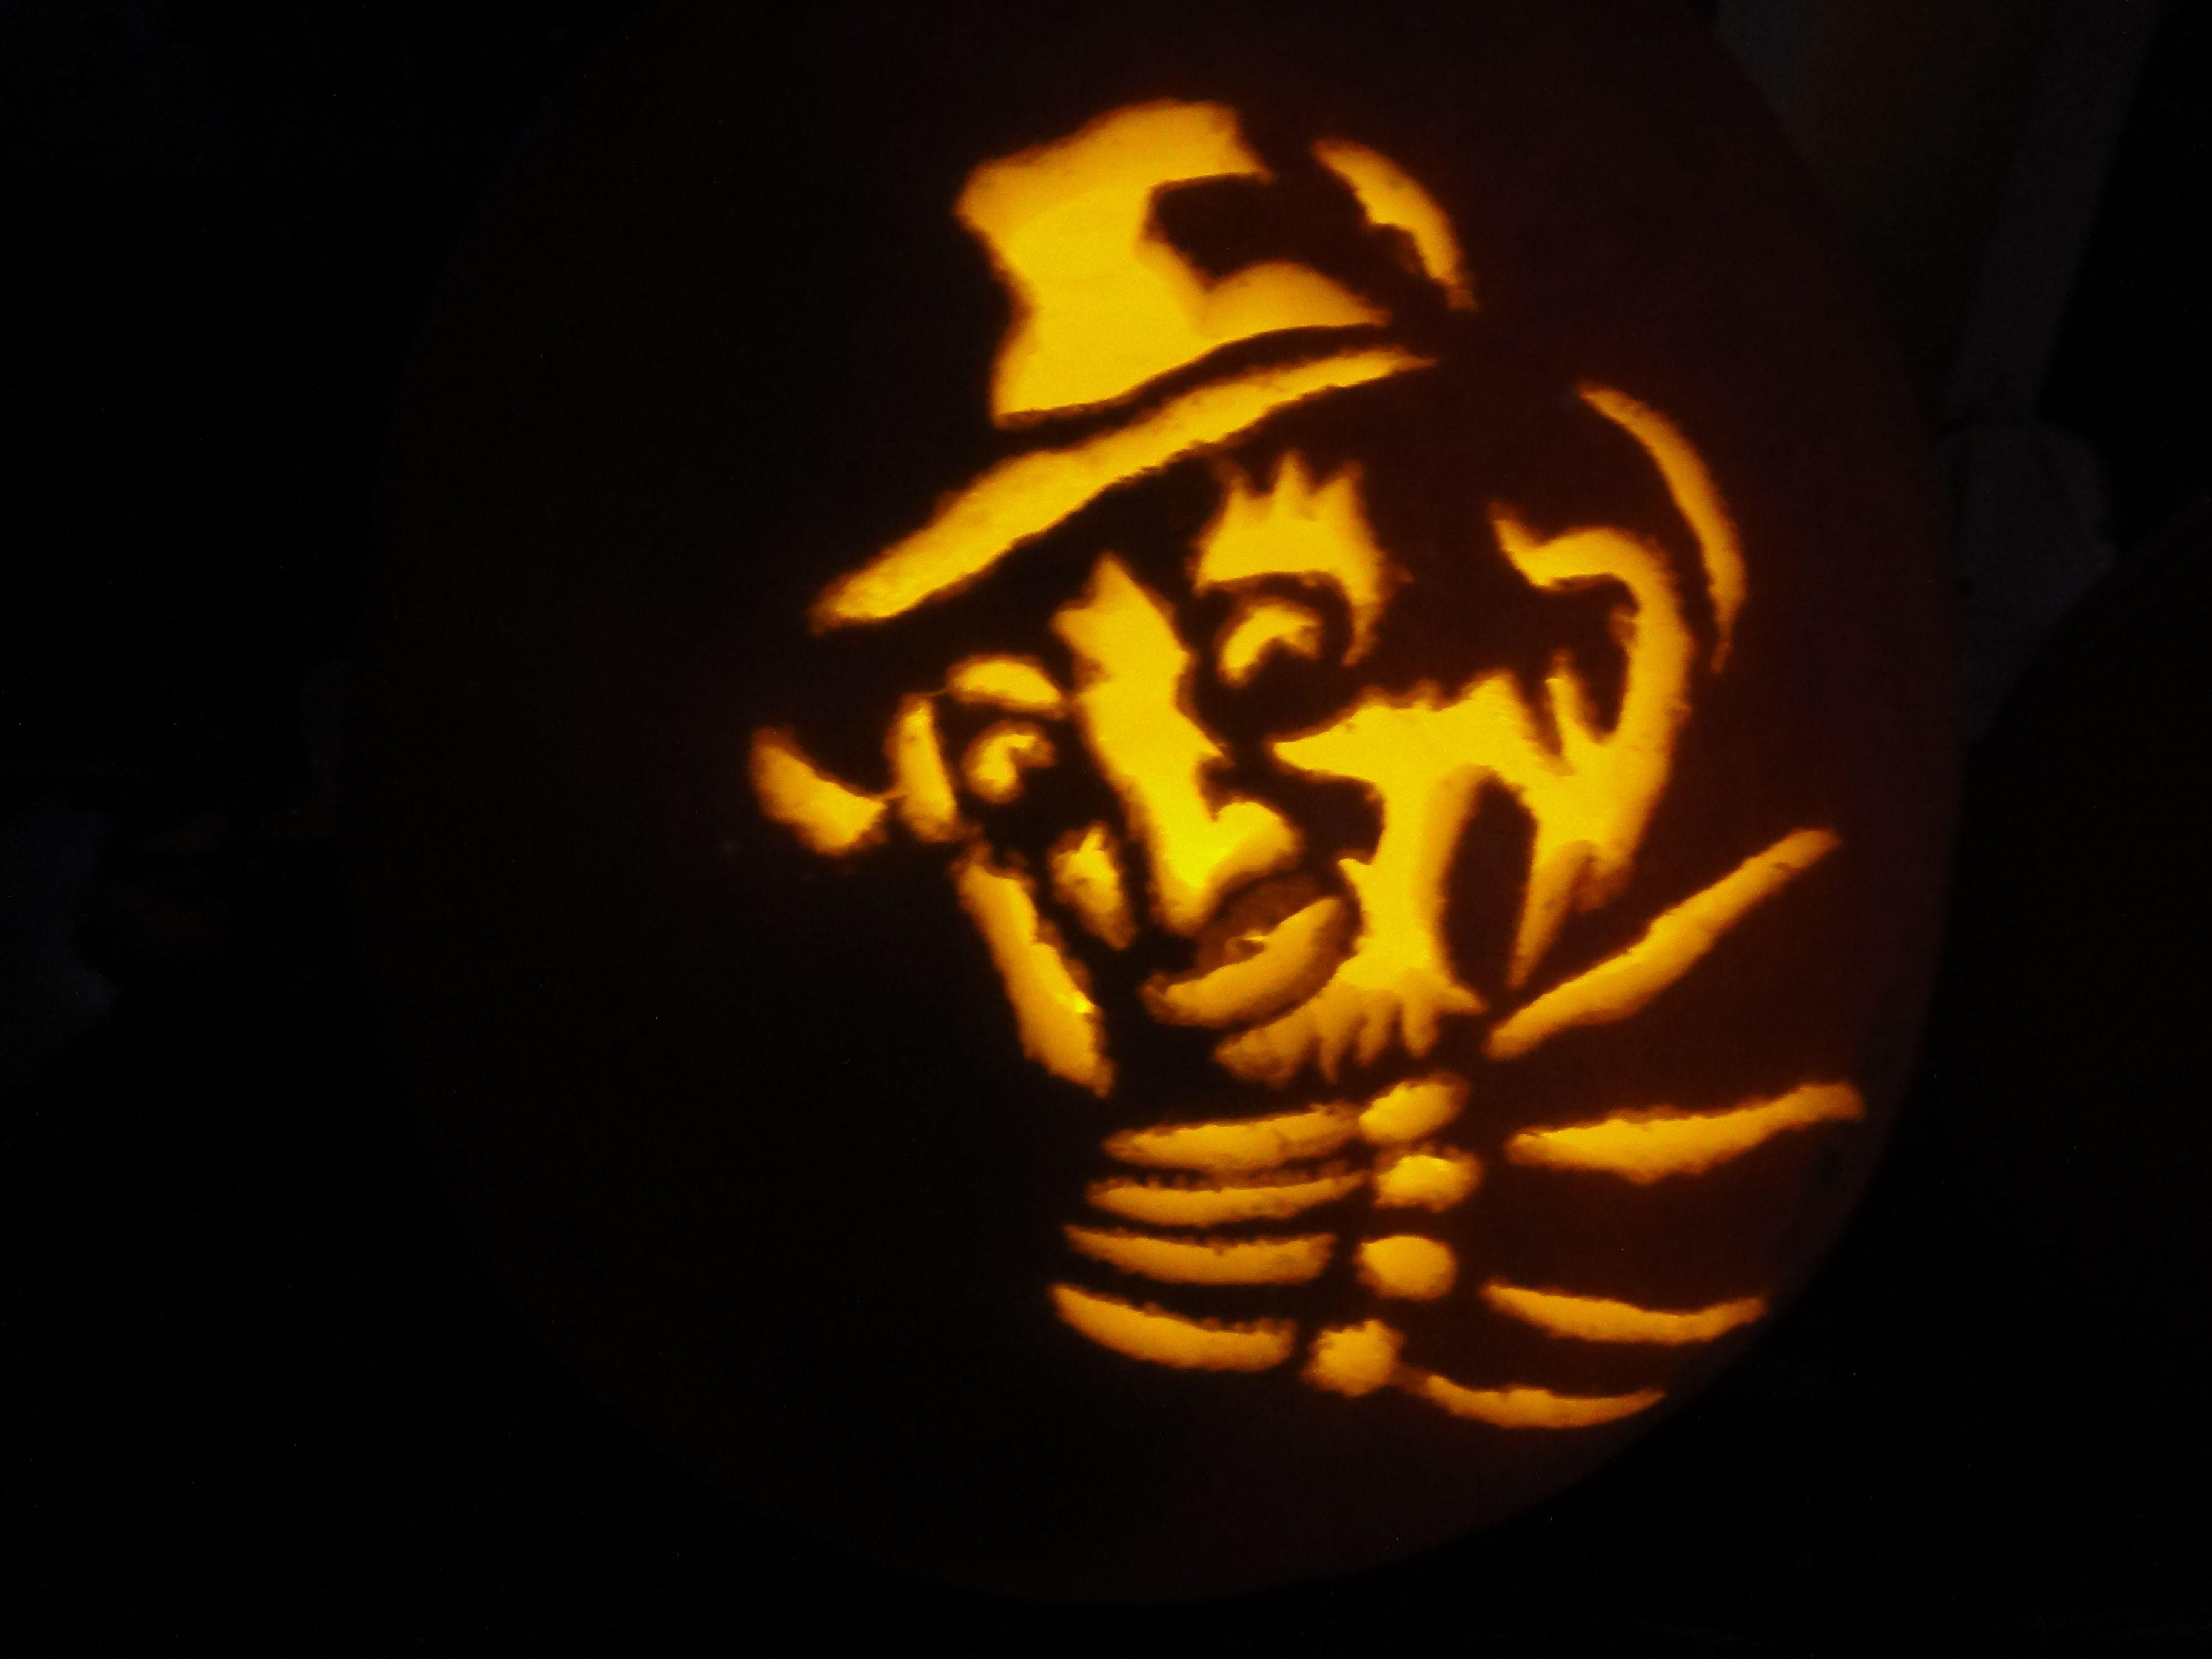 Freddy Krueger Pumpkin Design With Images Pumpkin Design Pumpkin Carving Pumpkin Carving Patterns